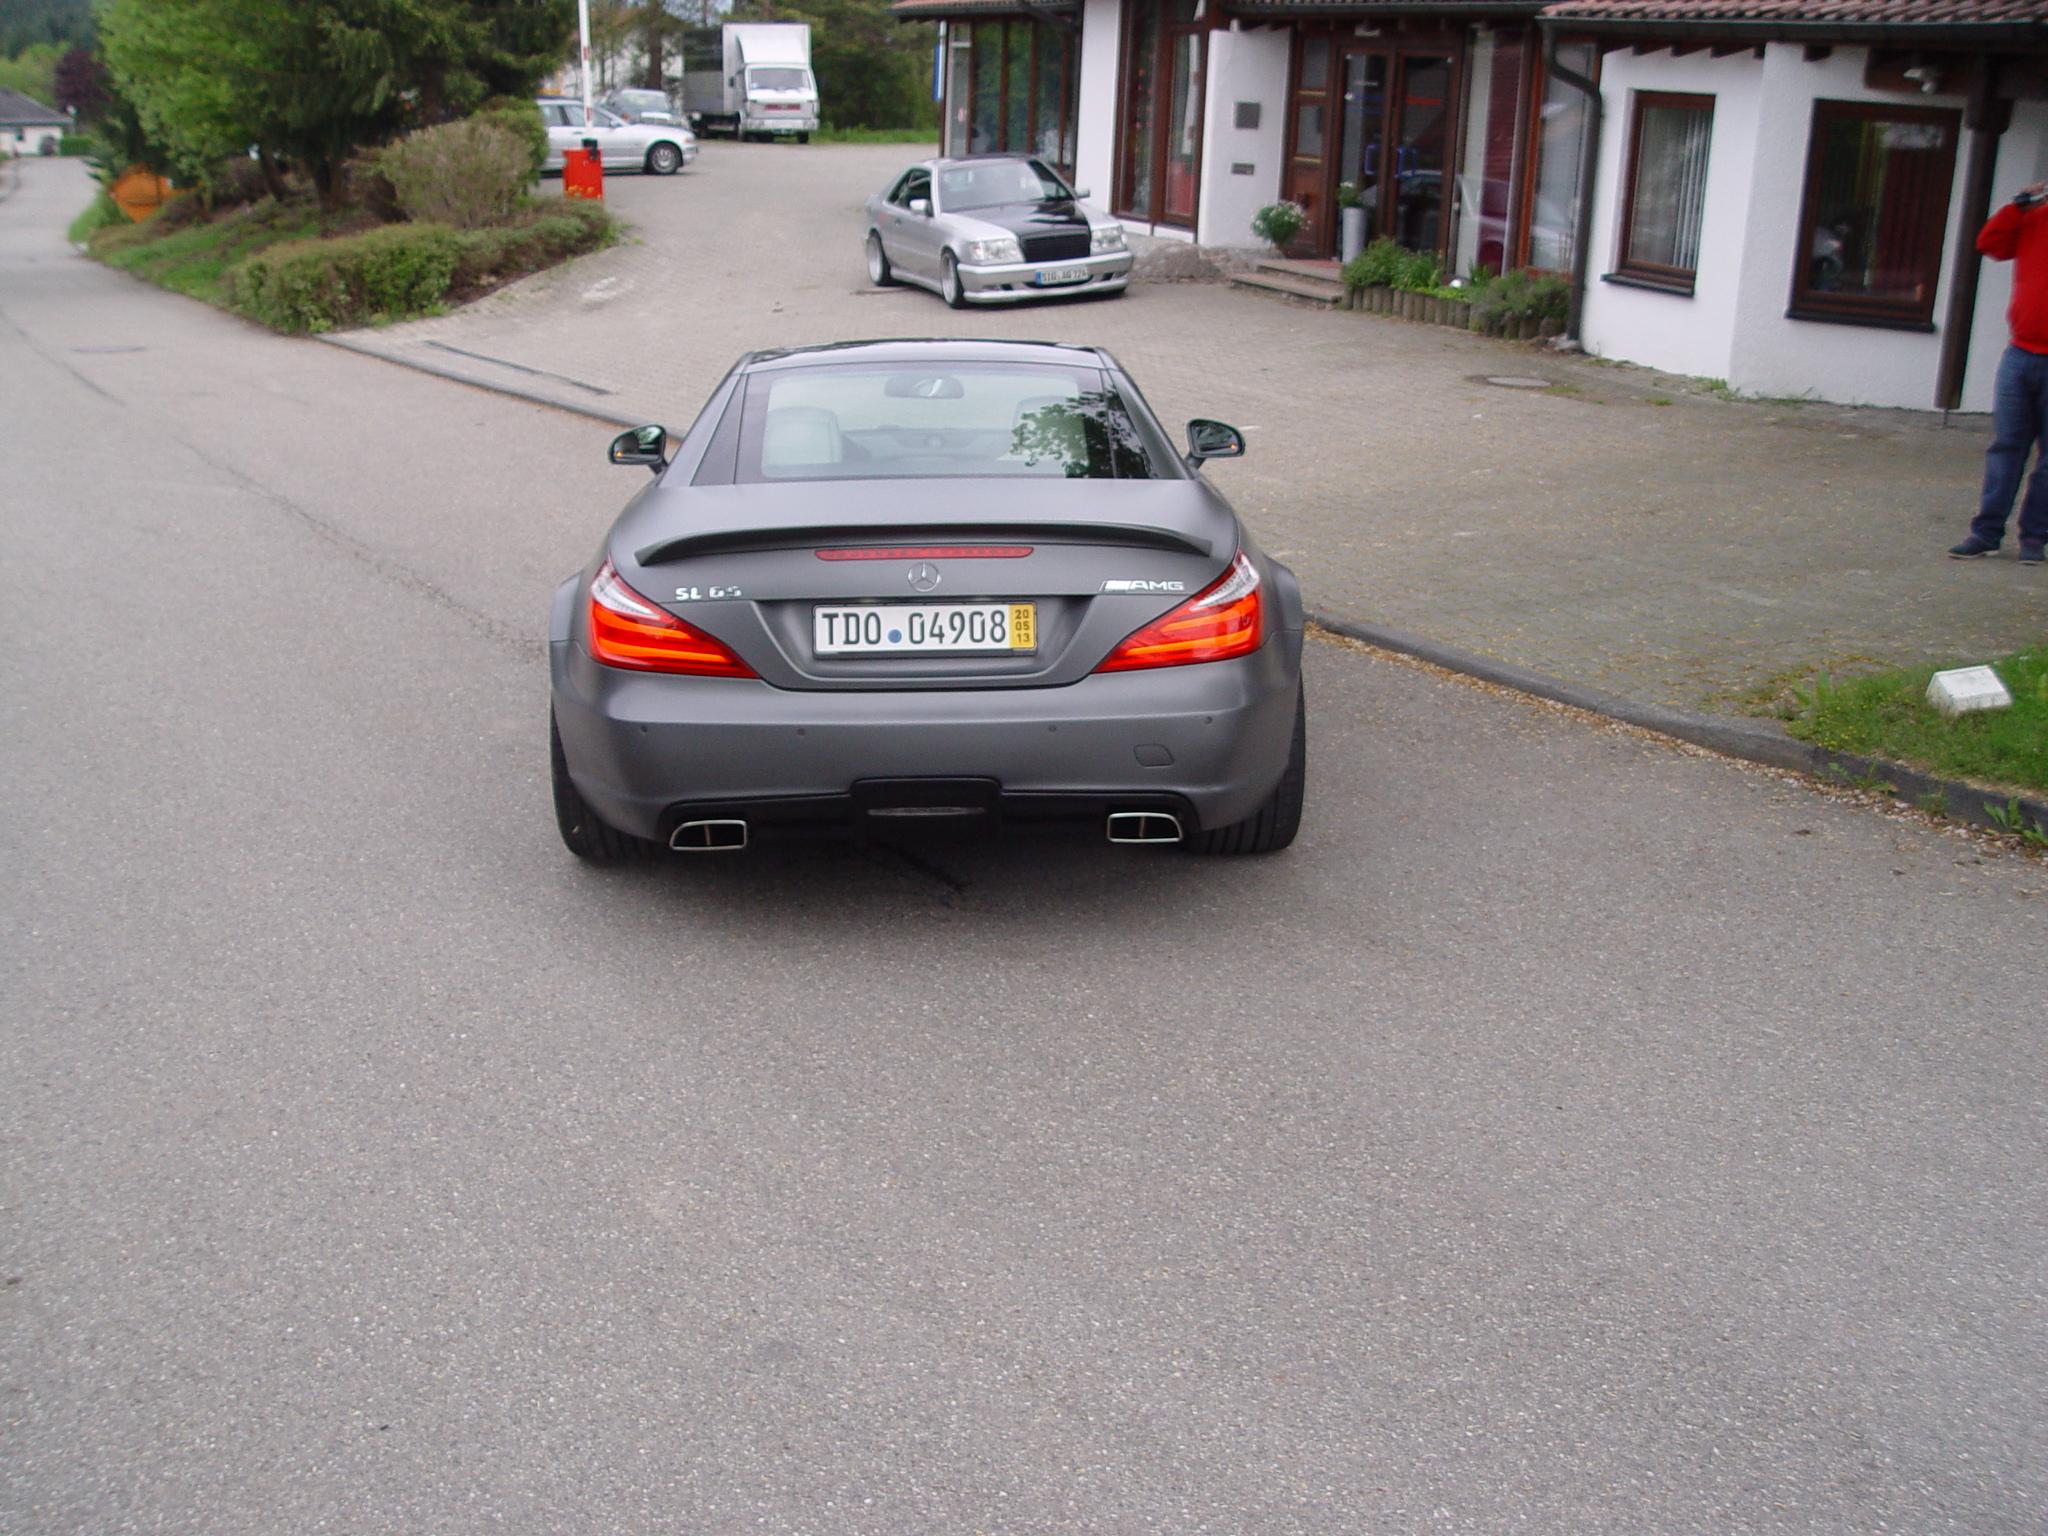 SL R231 Black Series AMG AMG63 AMG 65 Göckel Perfromance